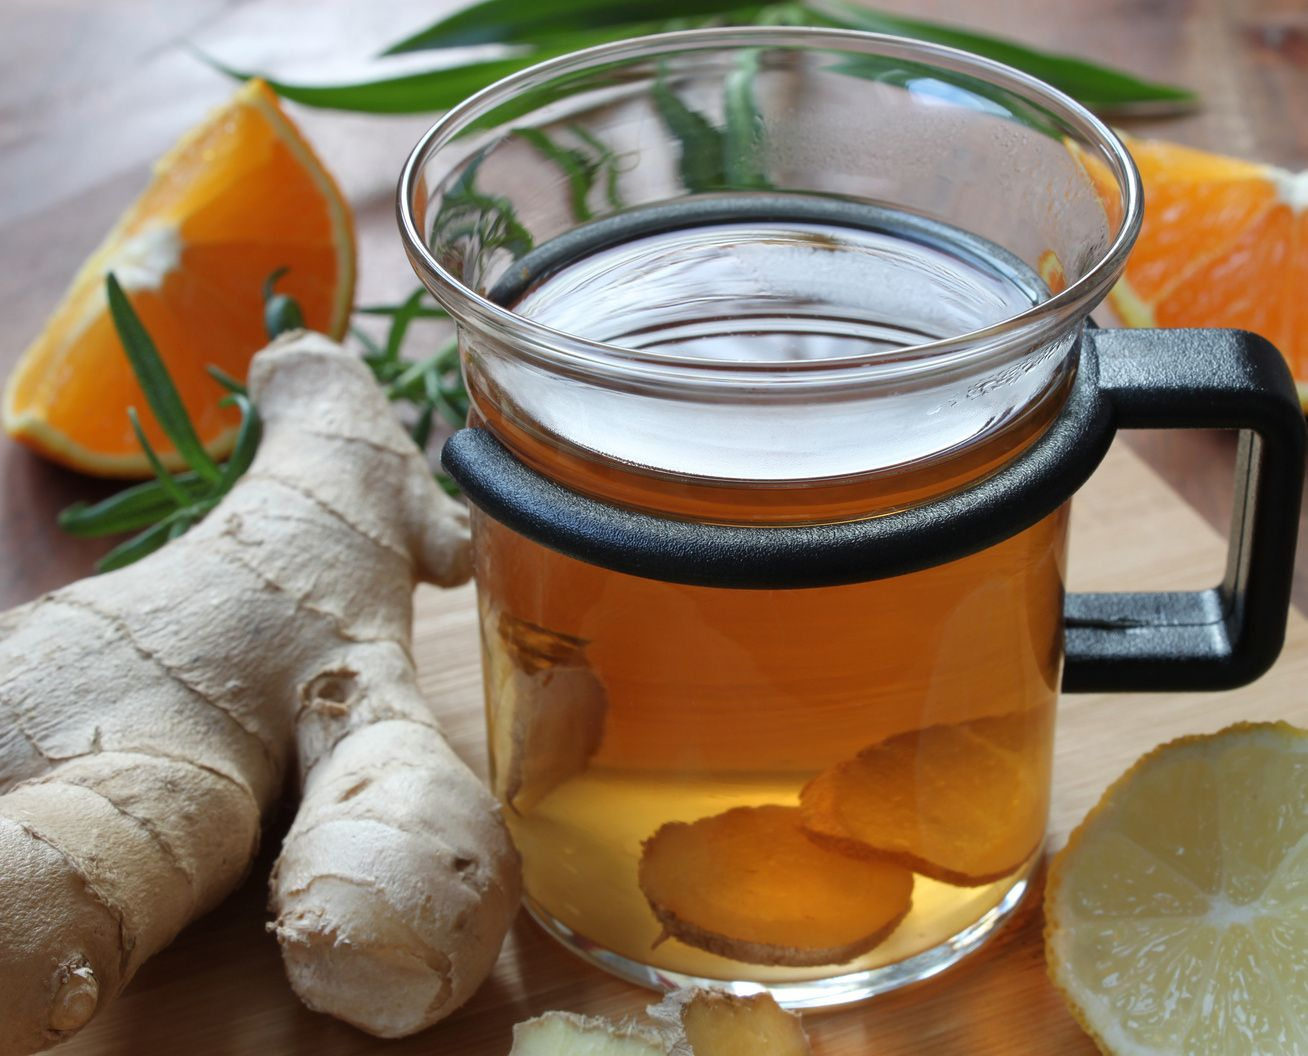 zöld tea diéta fogynis